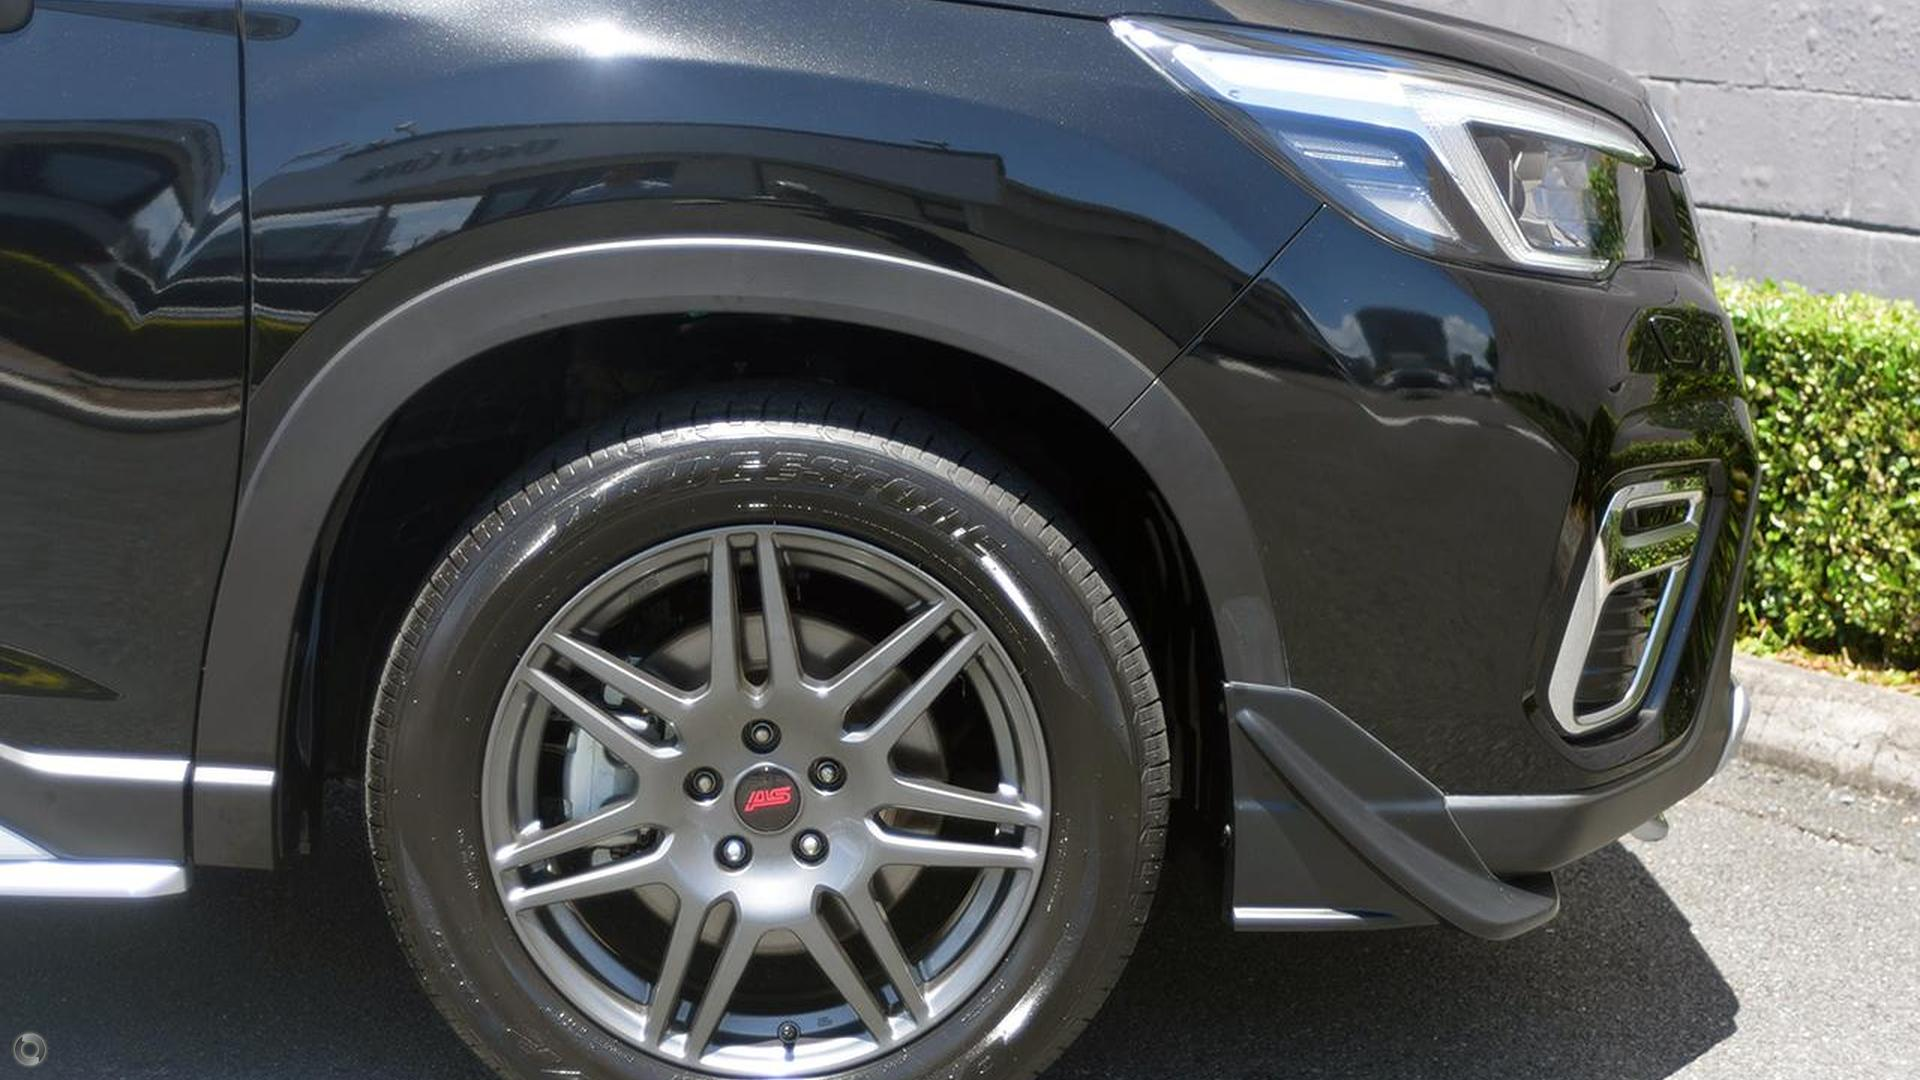 2018 Subaru Forester 2.5i-S S5